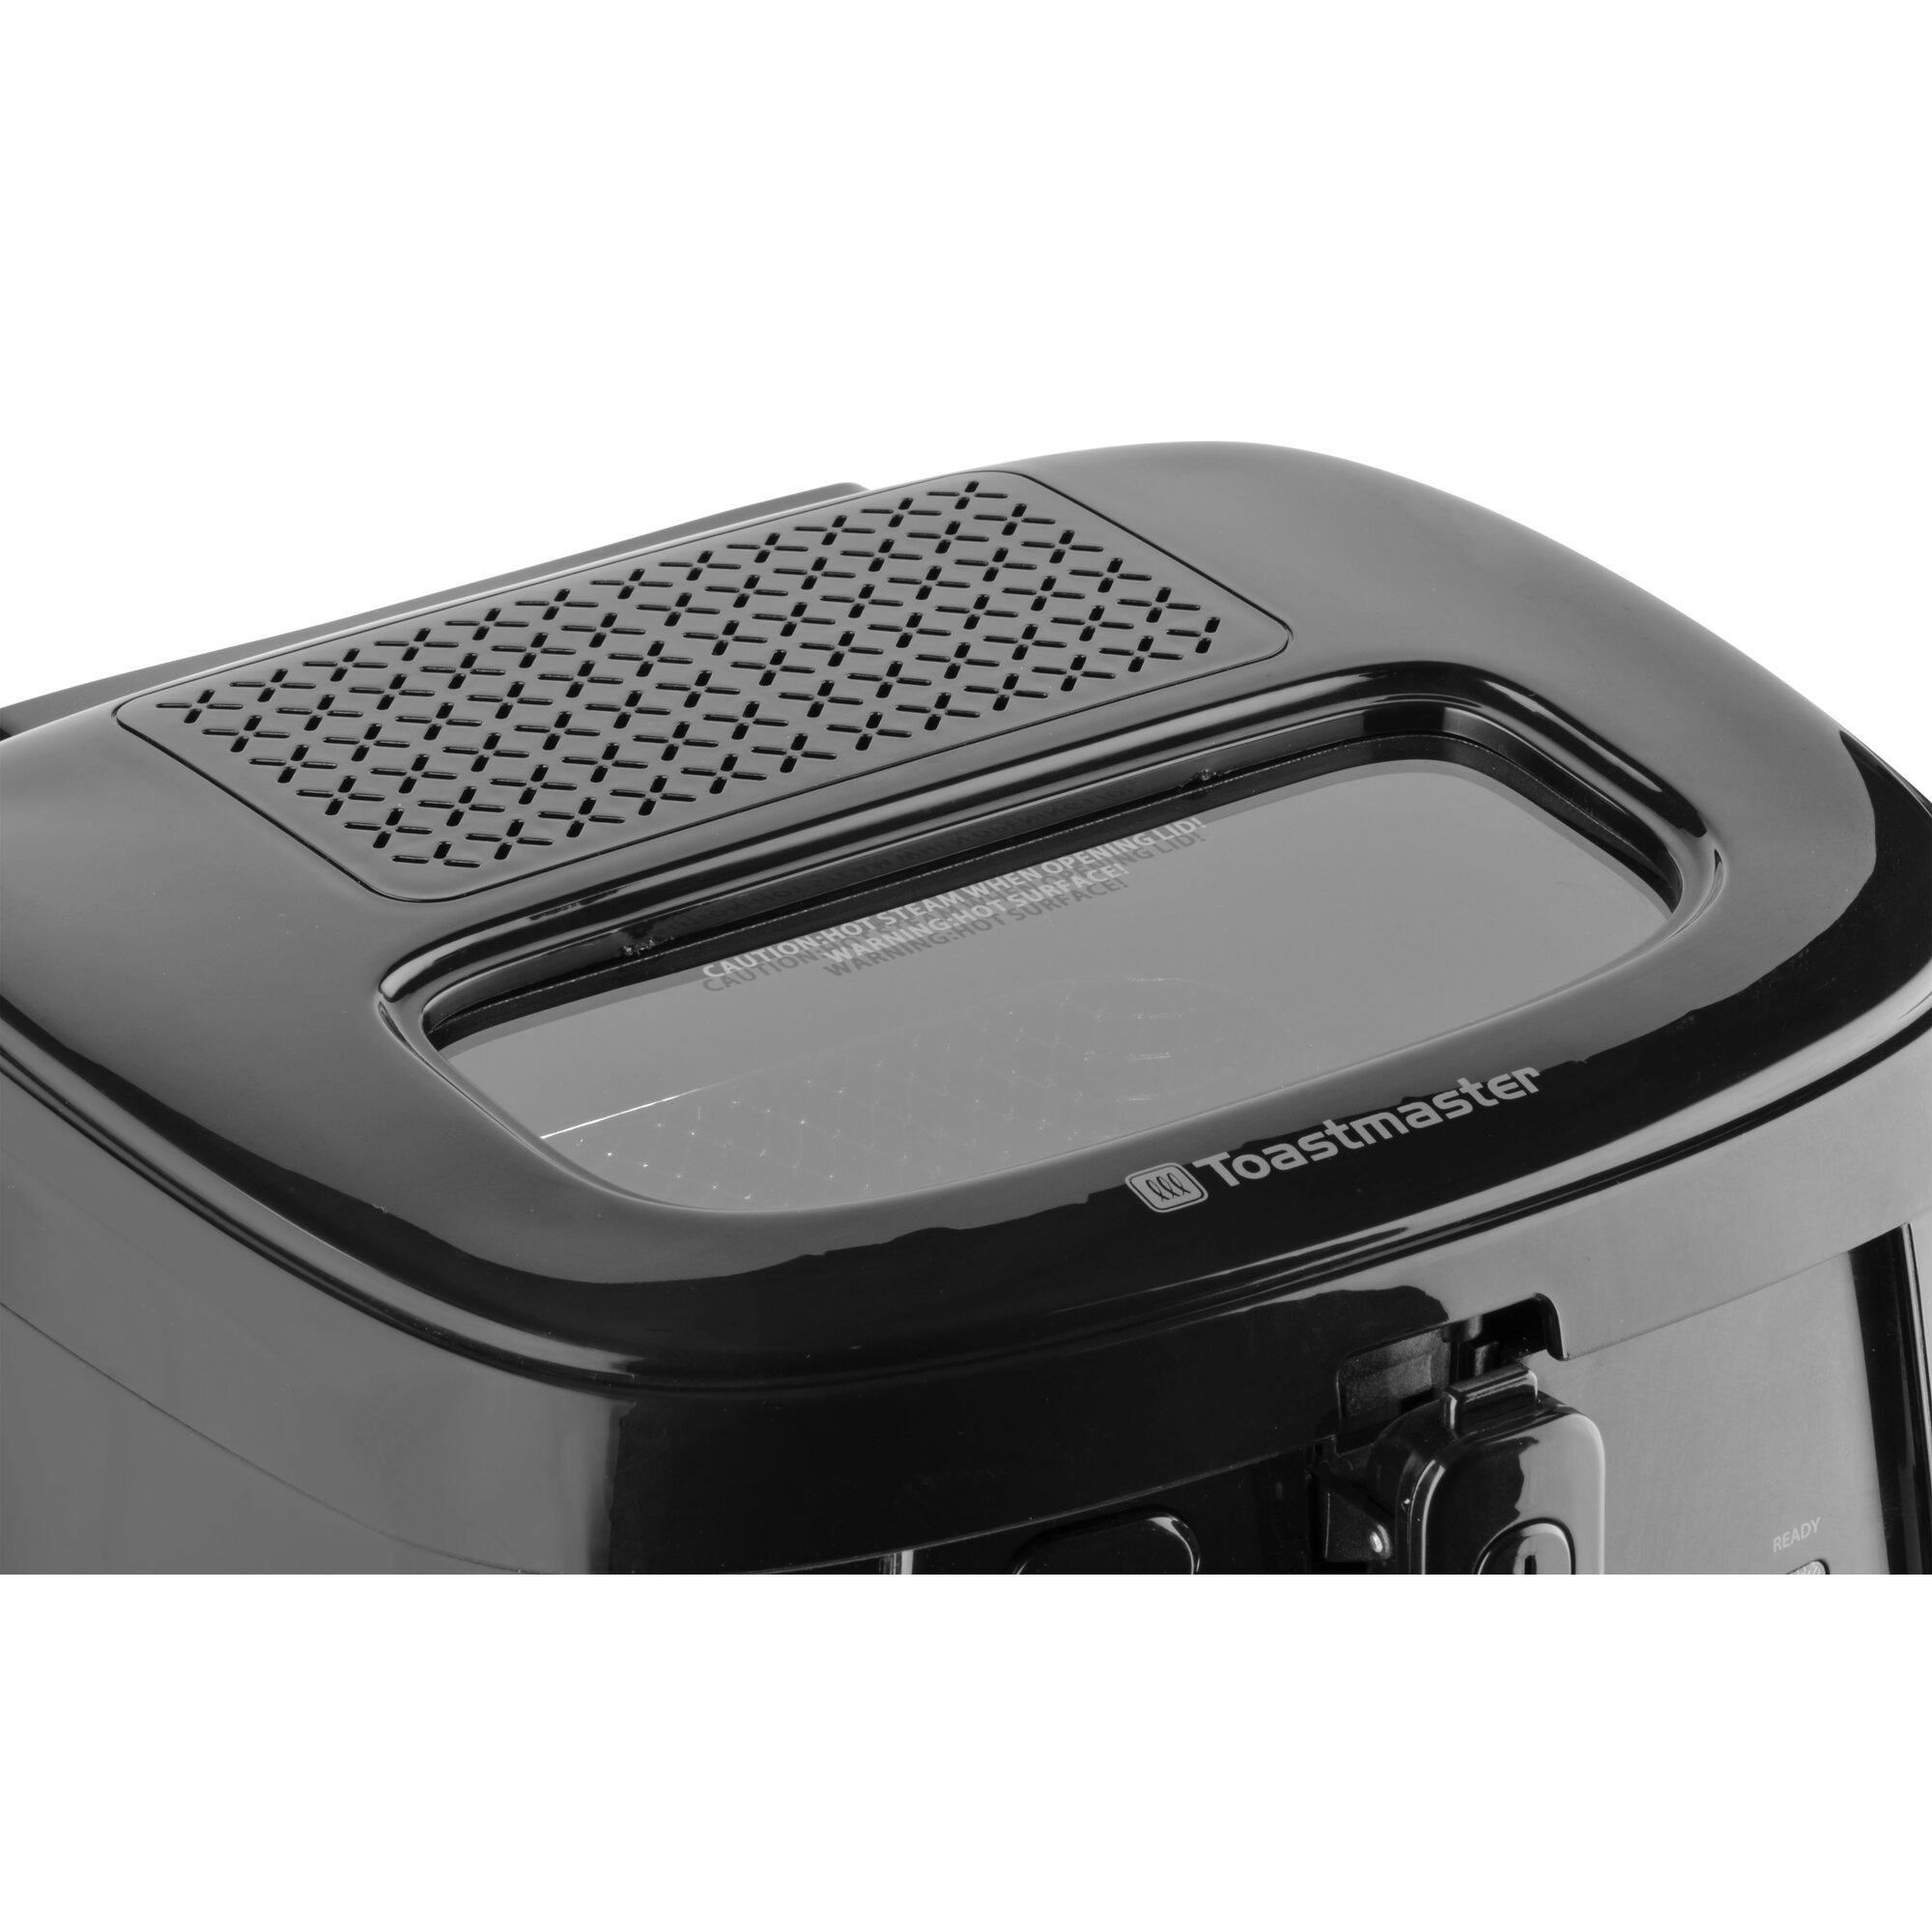 Uncategorized Toastmaster Kitchen Appliances toastmaster 2 5 liter 1500w deep fryer reviews wayfair fryer